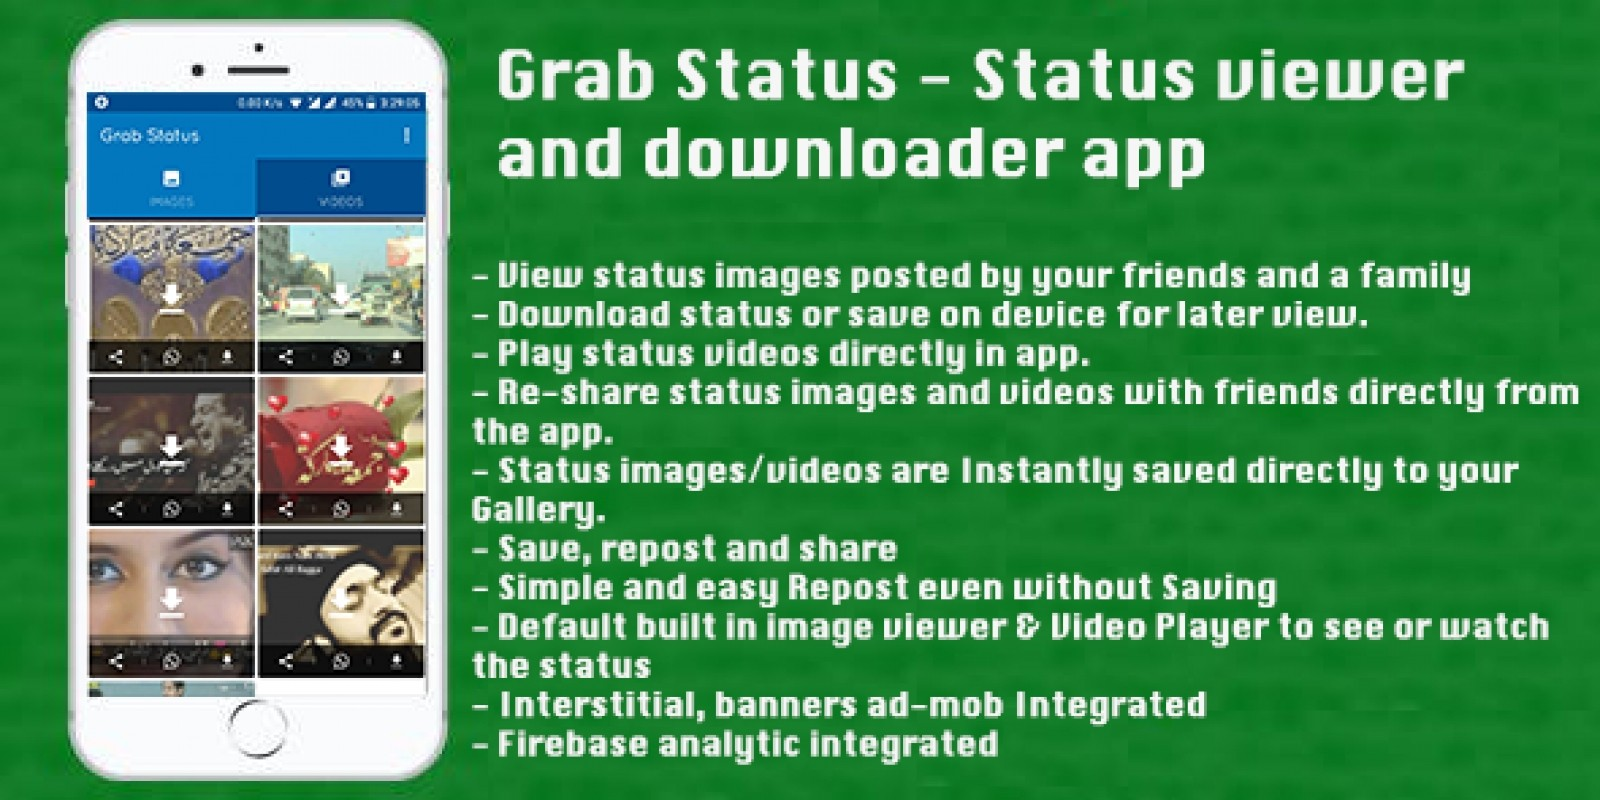 Grab Status - Android Source Code